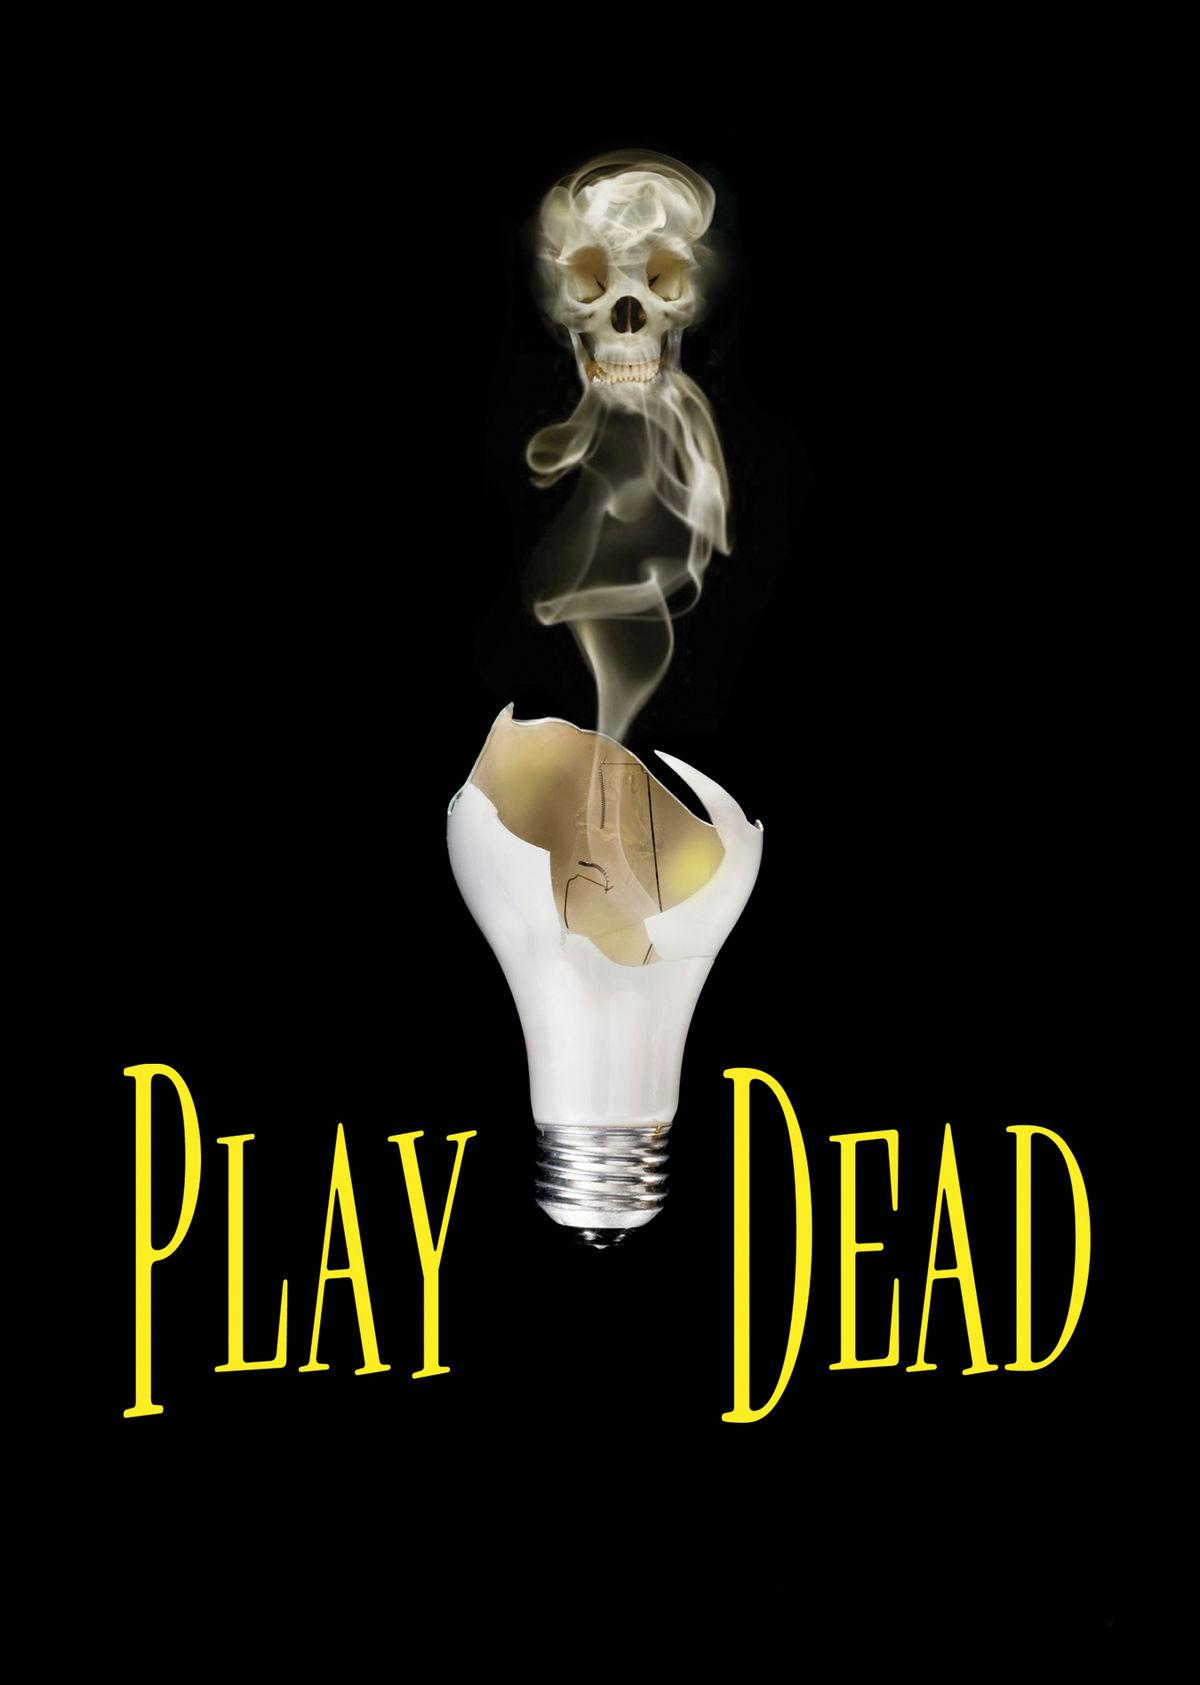 Play Dead Show Wikipedia